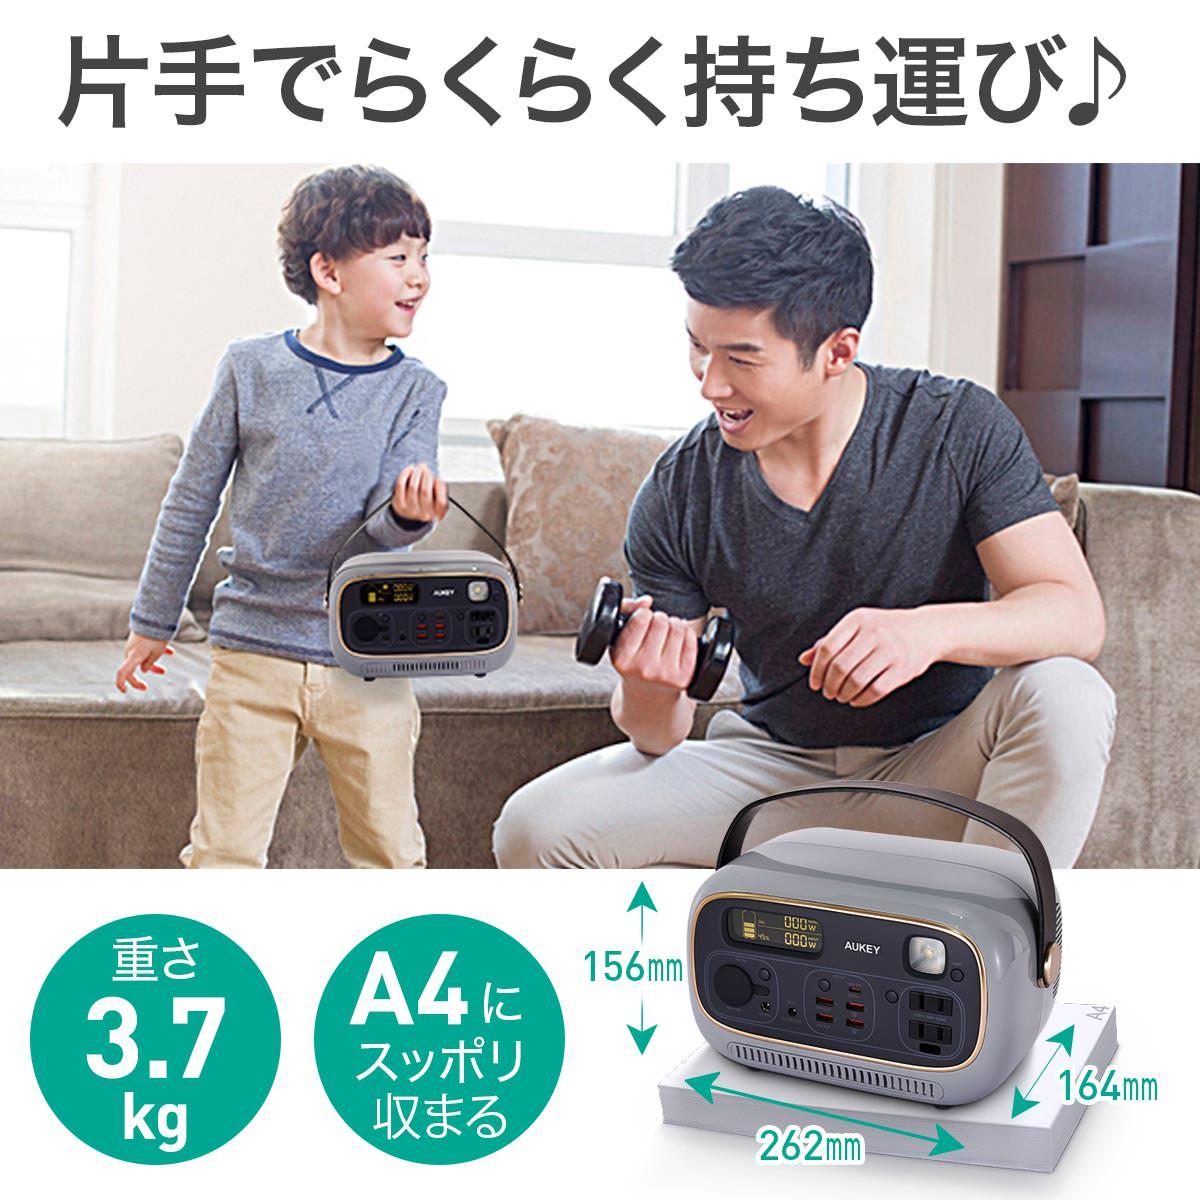 AUKEY、レトロな雰囲気の片手で持てるポータブル電源「PowerStudio」39,800円で発売 4